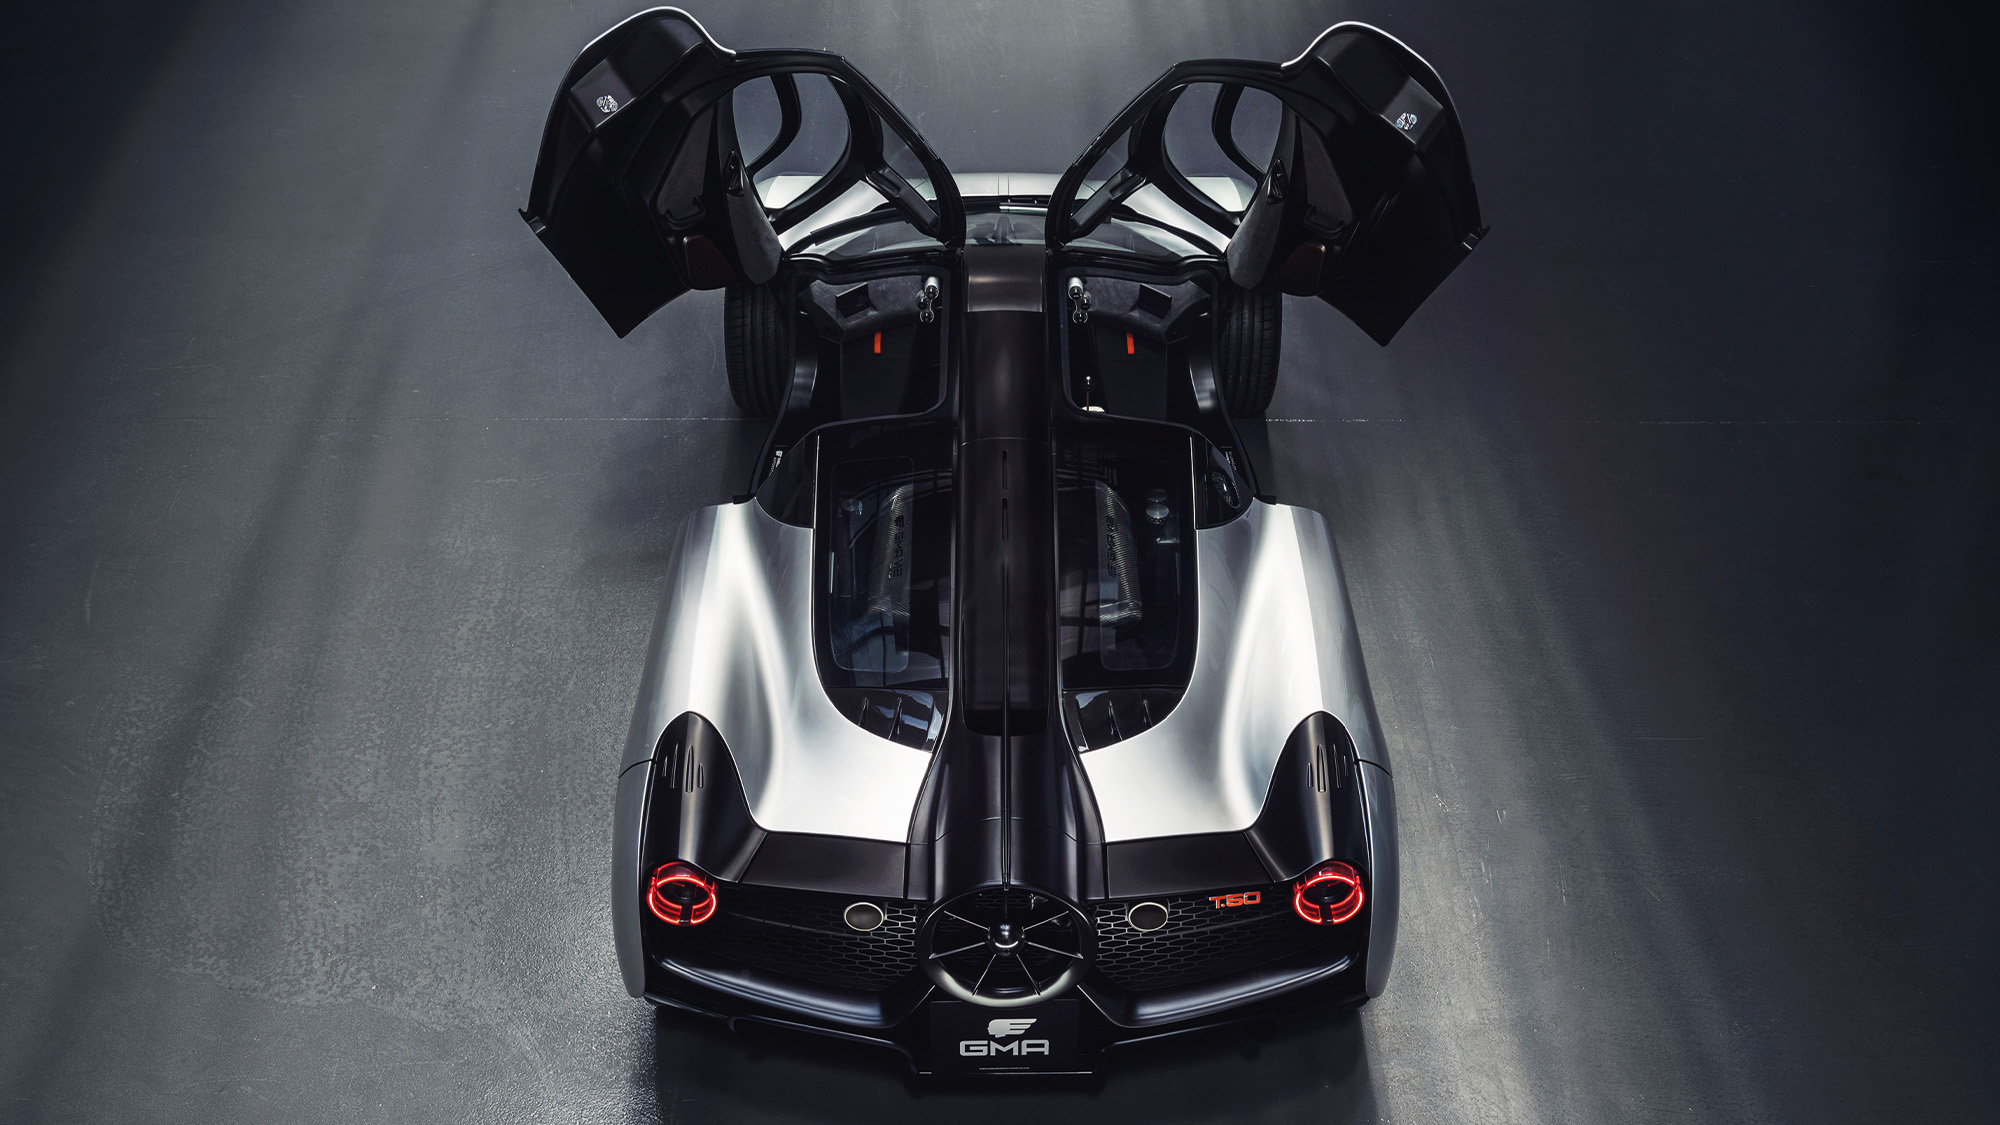 Gordon Murray Design T50 supercar